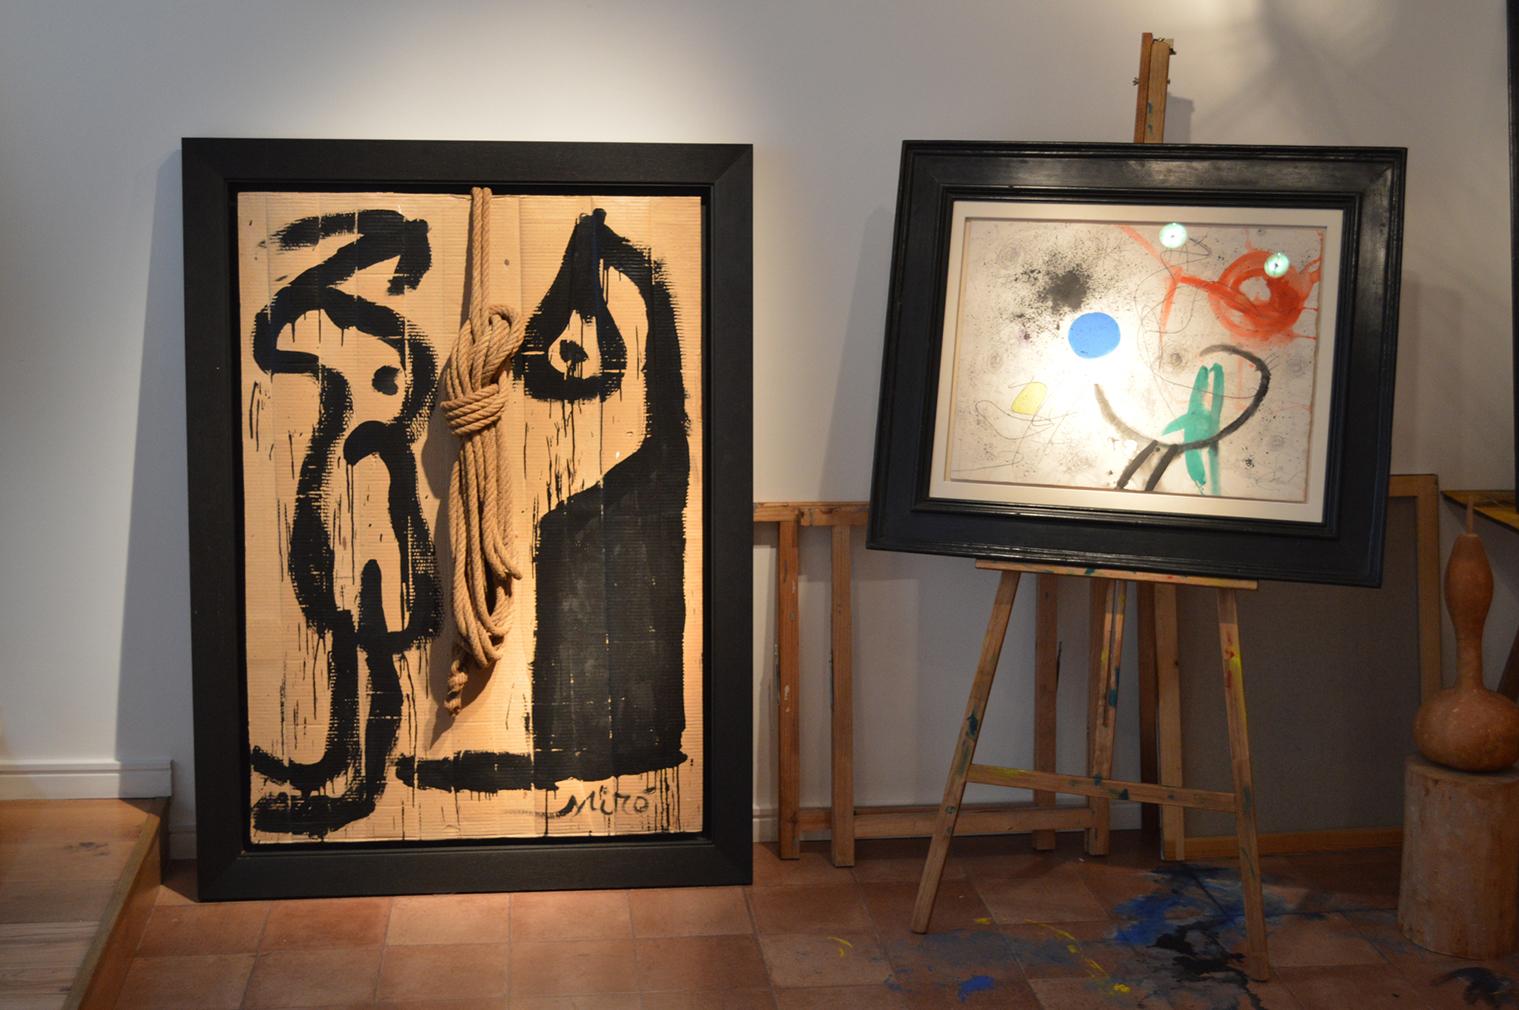 Miró's studio, Mayoral at 6 Duke Street St James's, London, 21 January – 12 February 2016